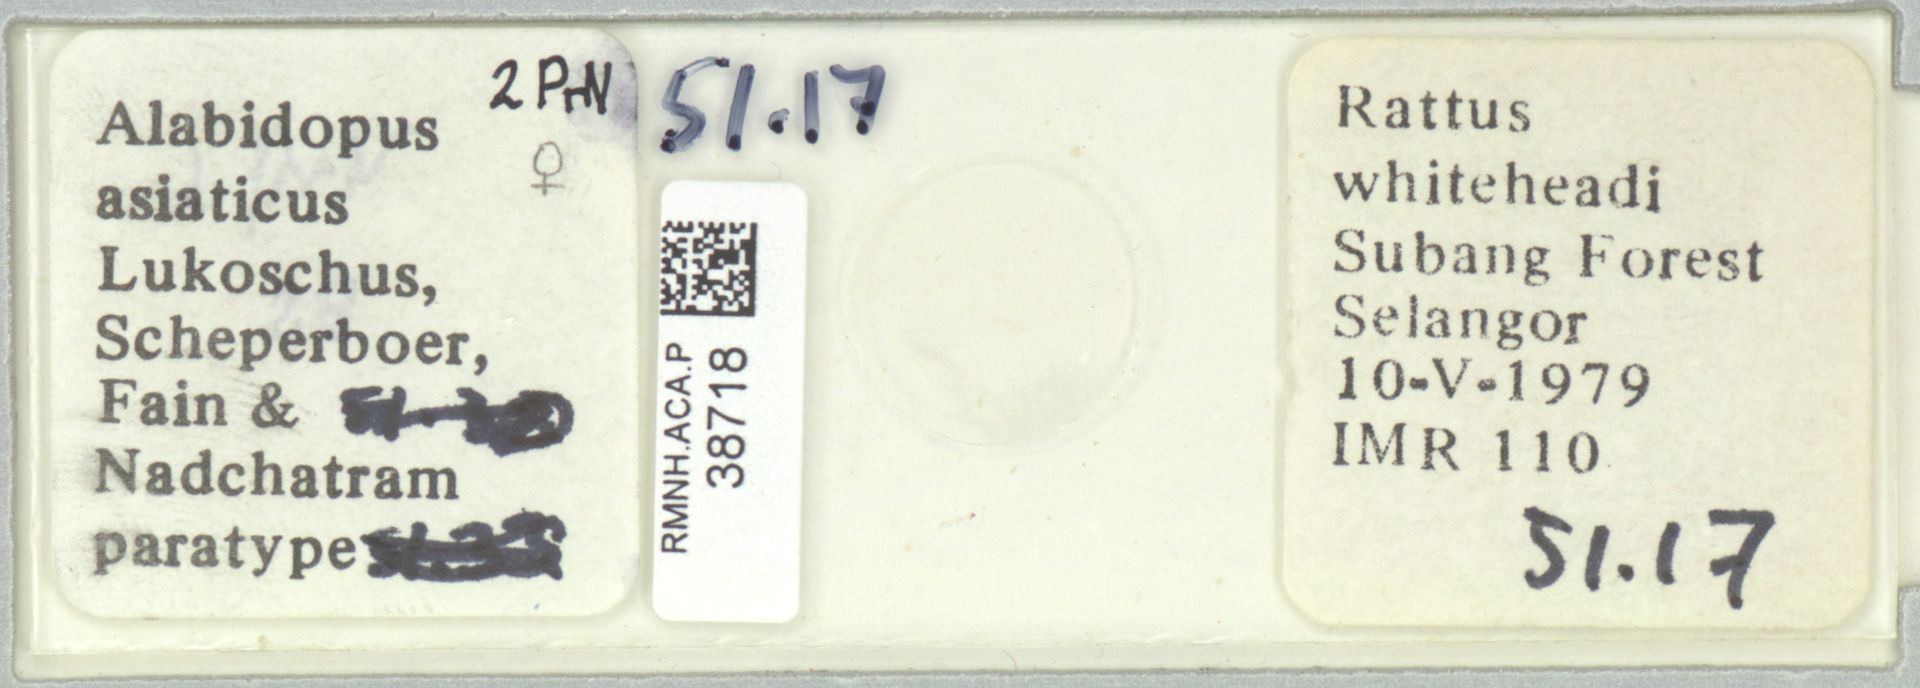 RMNH.ACA.P.38718   Alabidopus asiaticus Lukoschus, Scheperboer, Fain & Nadchatram